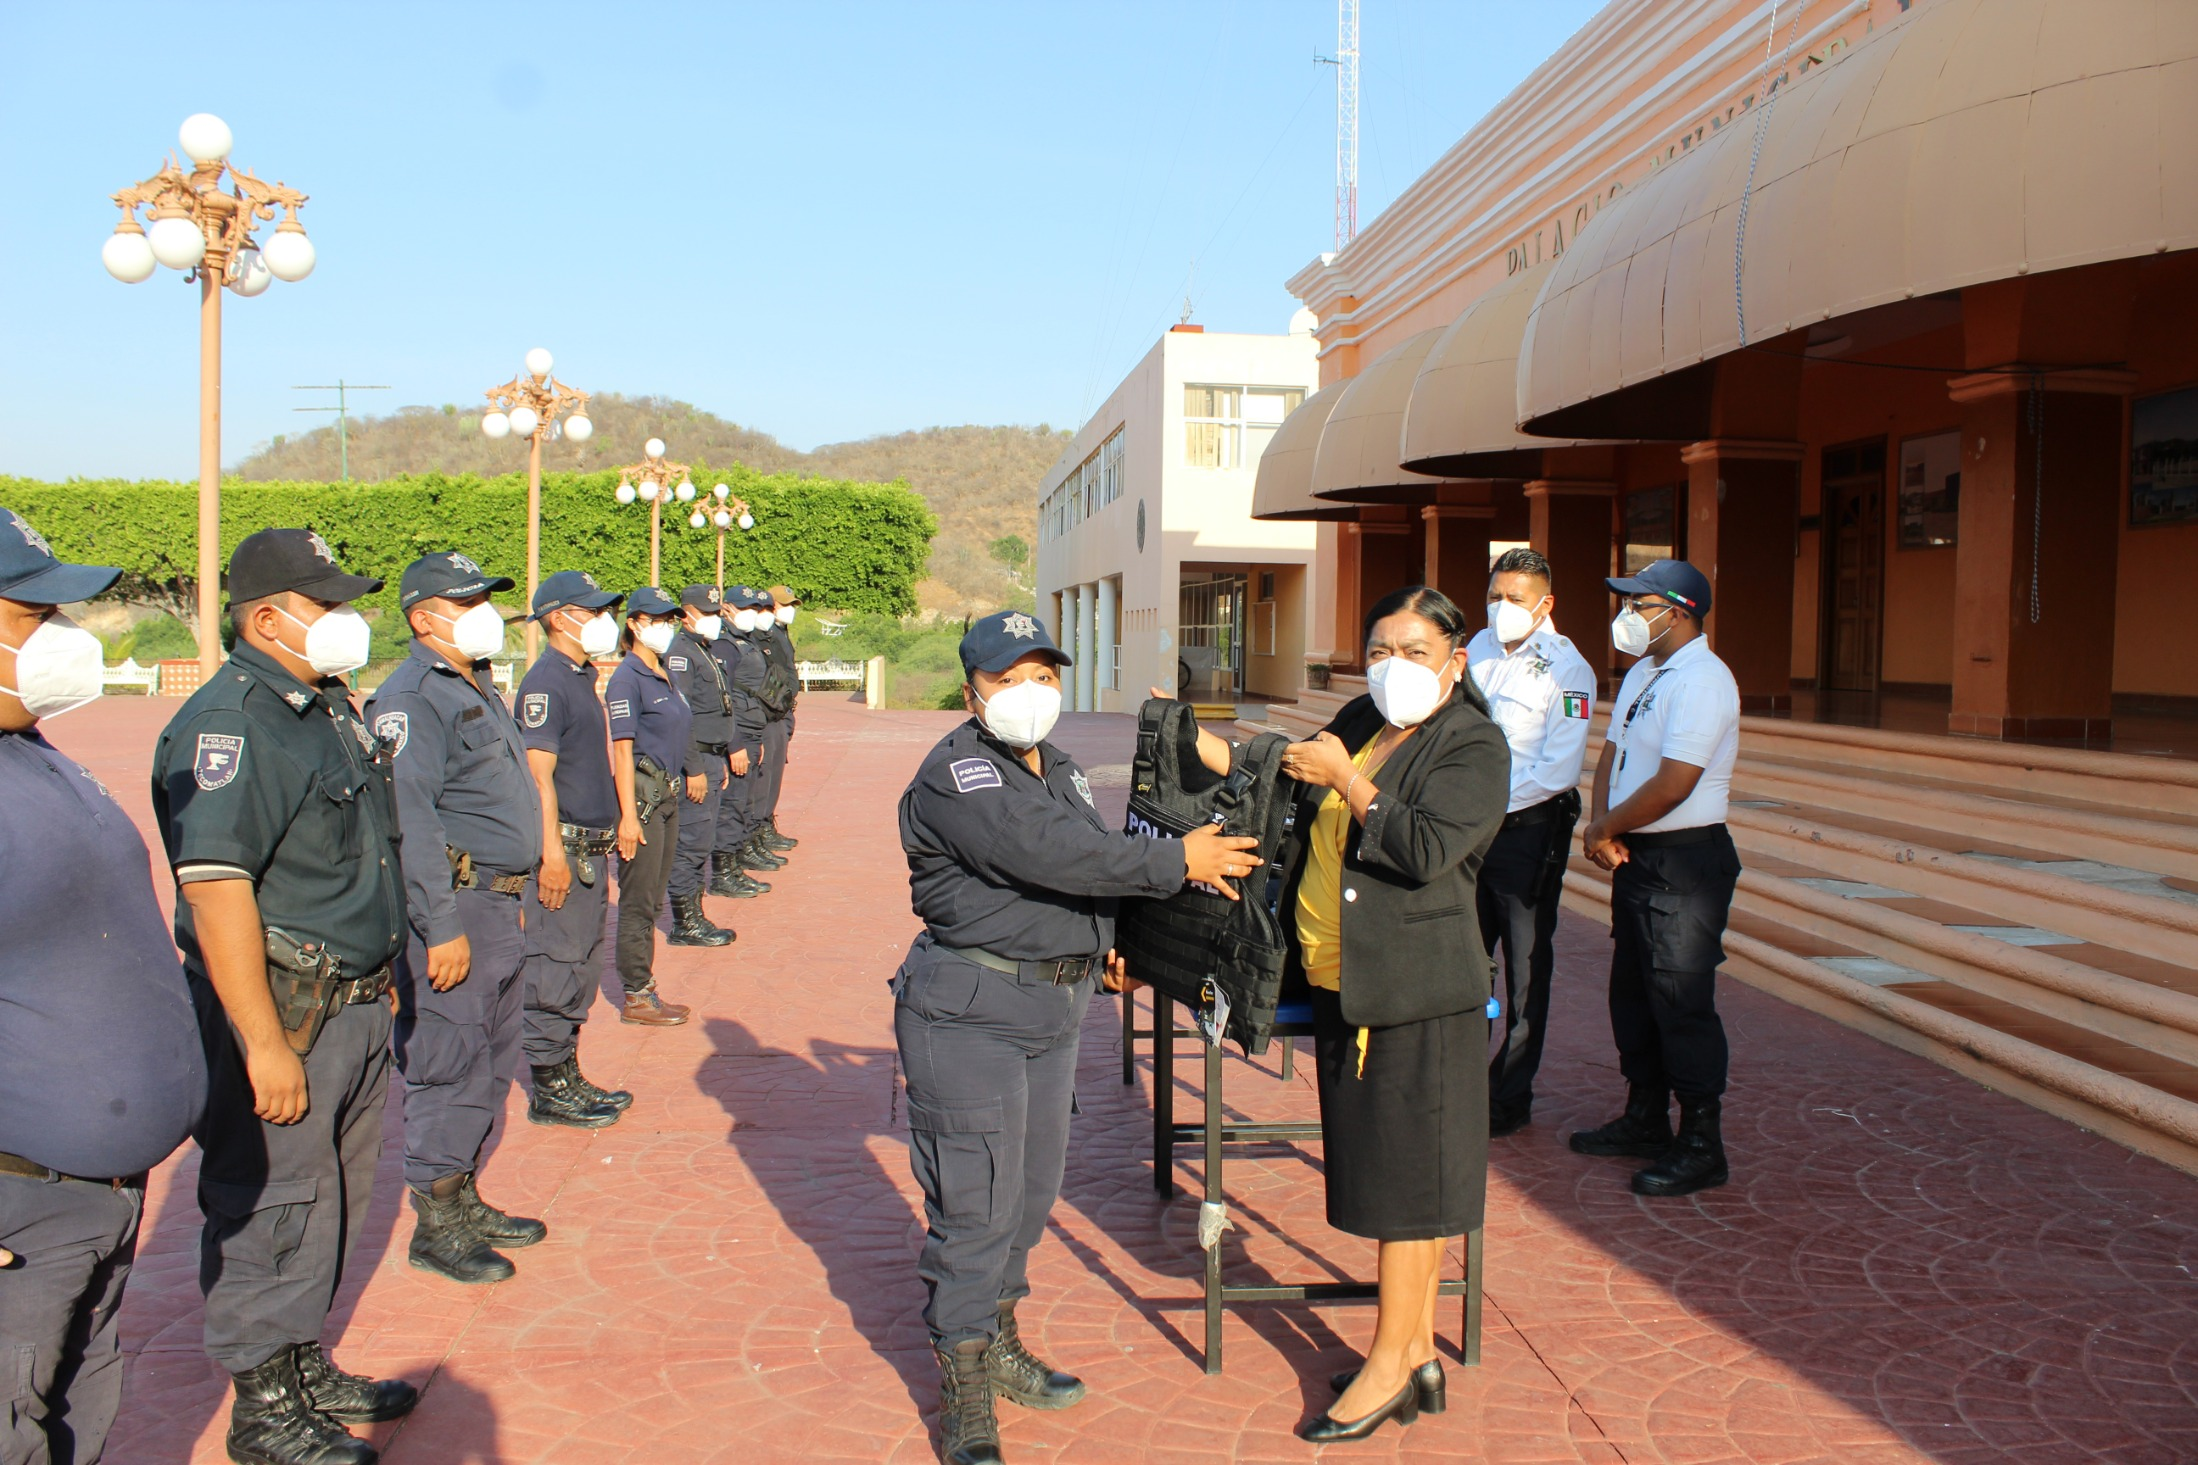 Alcadesa de Tecomatlán entrega uniformes a Seguridad Pública